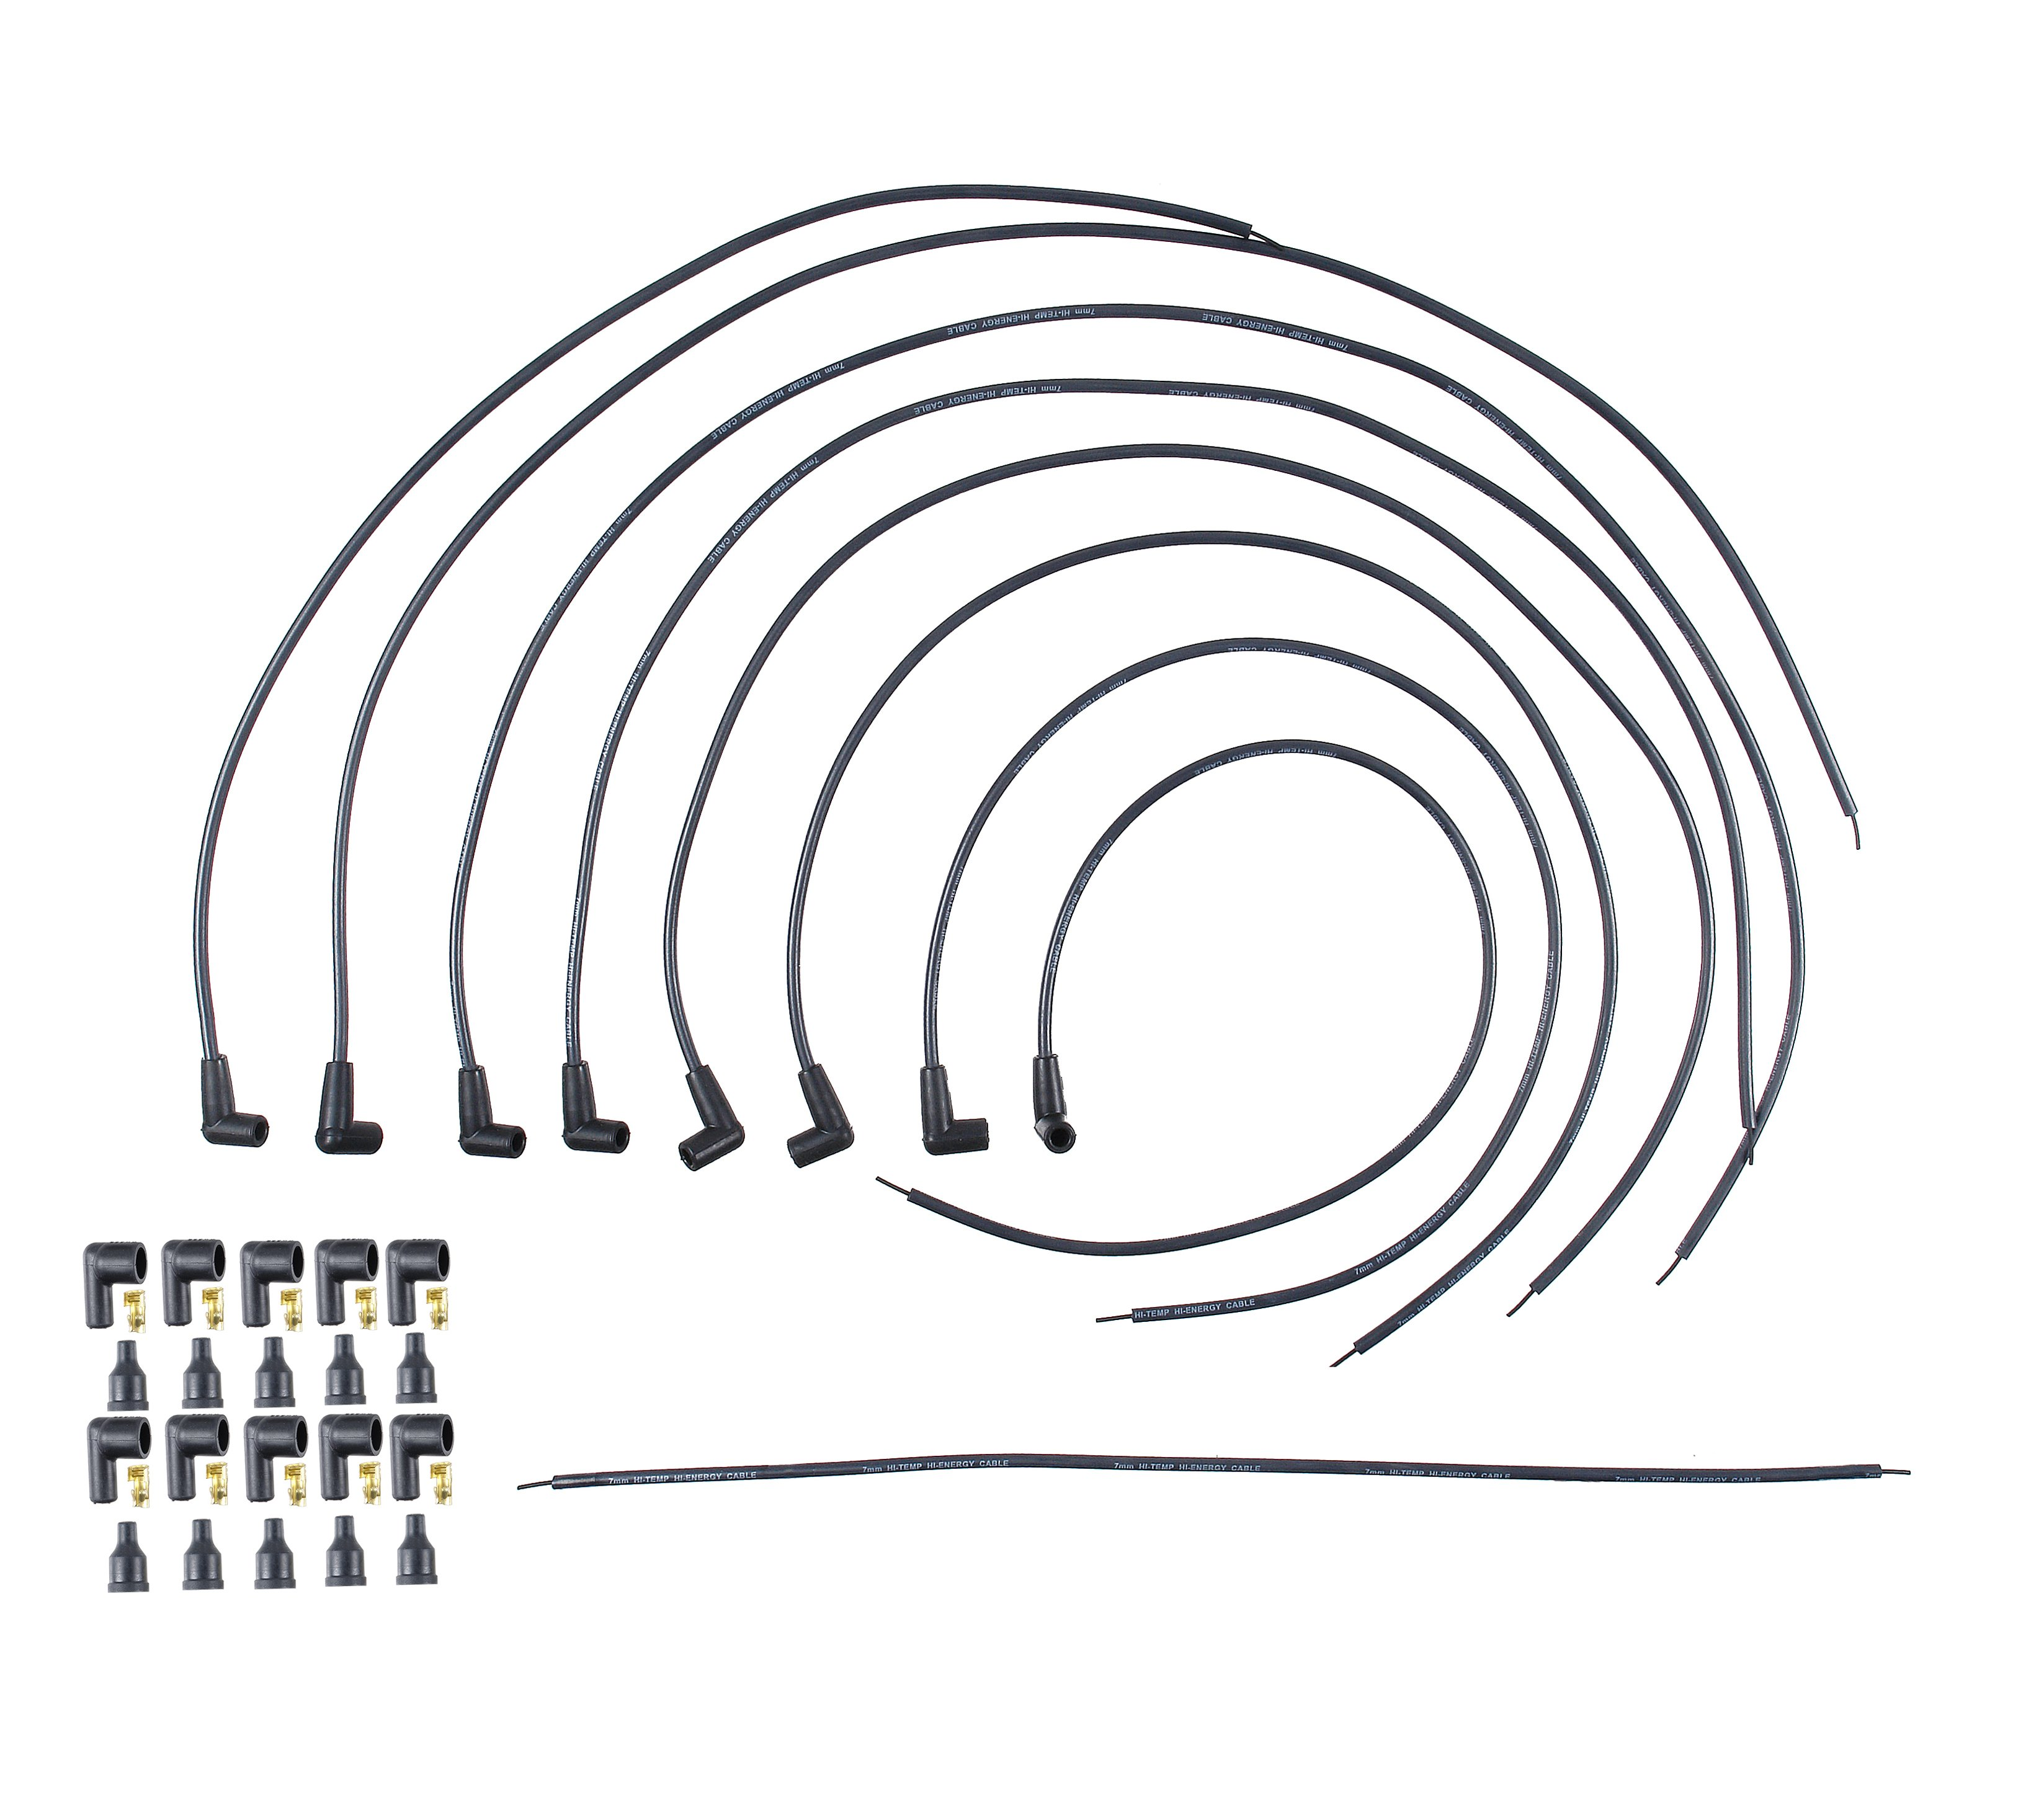 Proconnect Universal Spark Plug Wire Sets